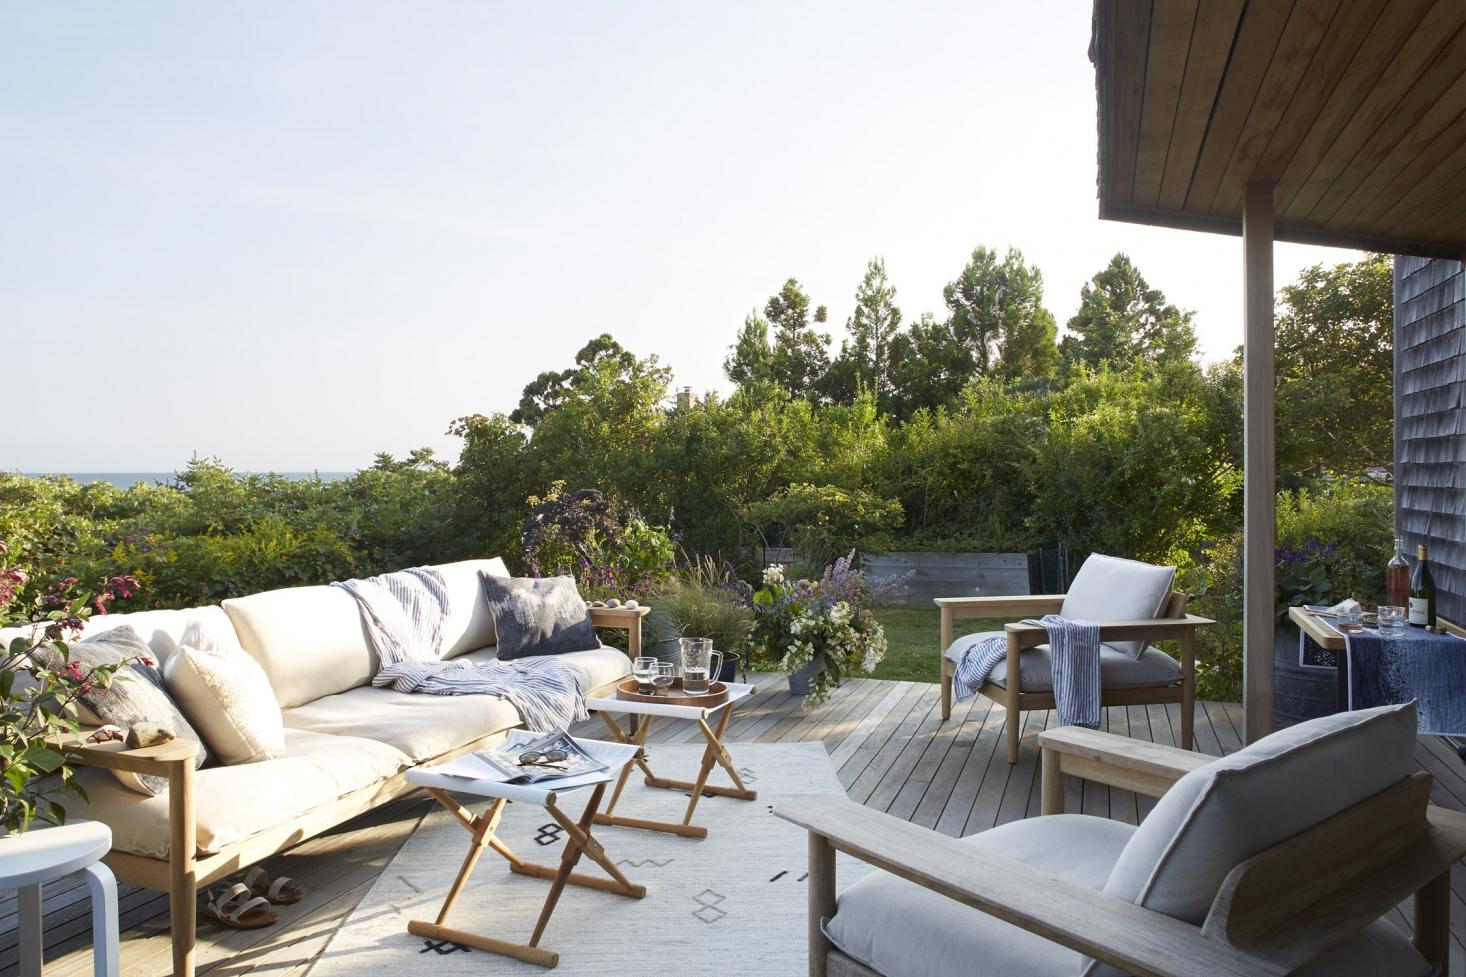 massachusetts-summer-patio-sofa-lounge-chairs-outdoor-1466x977.jpg